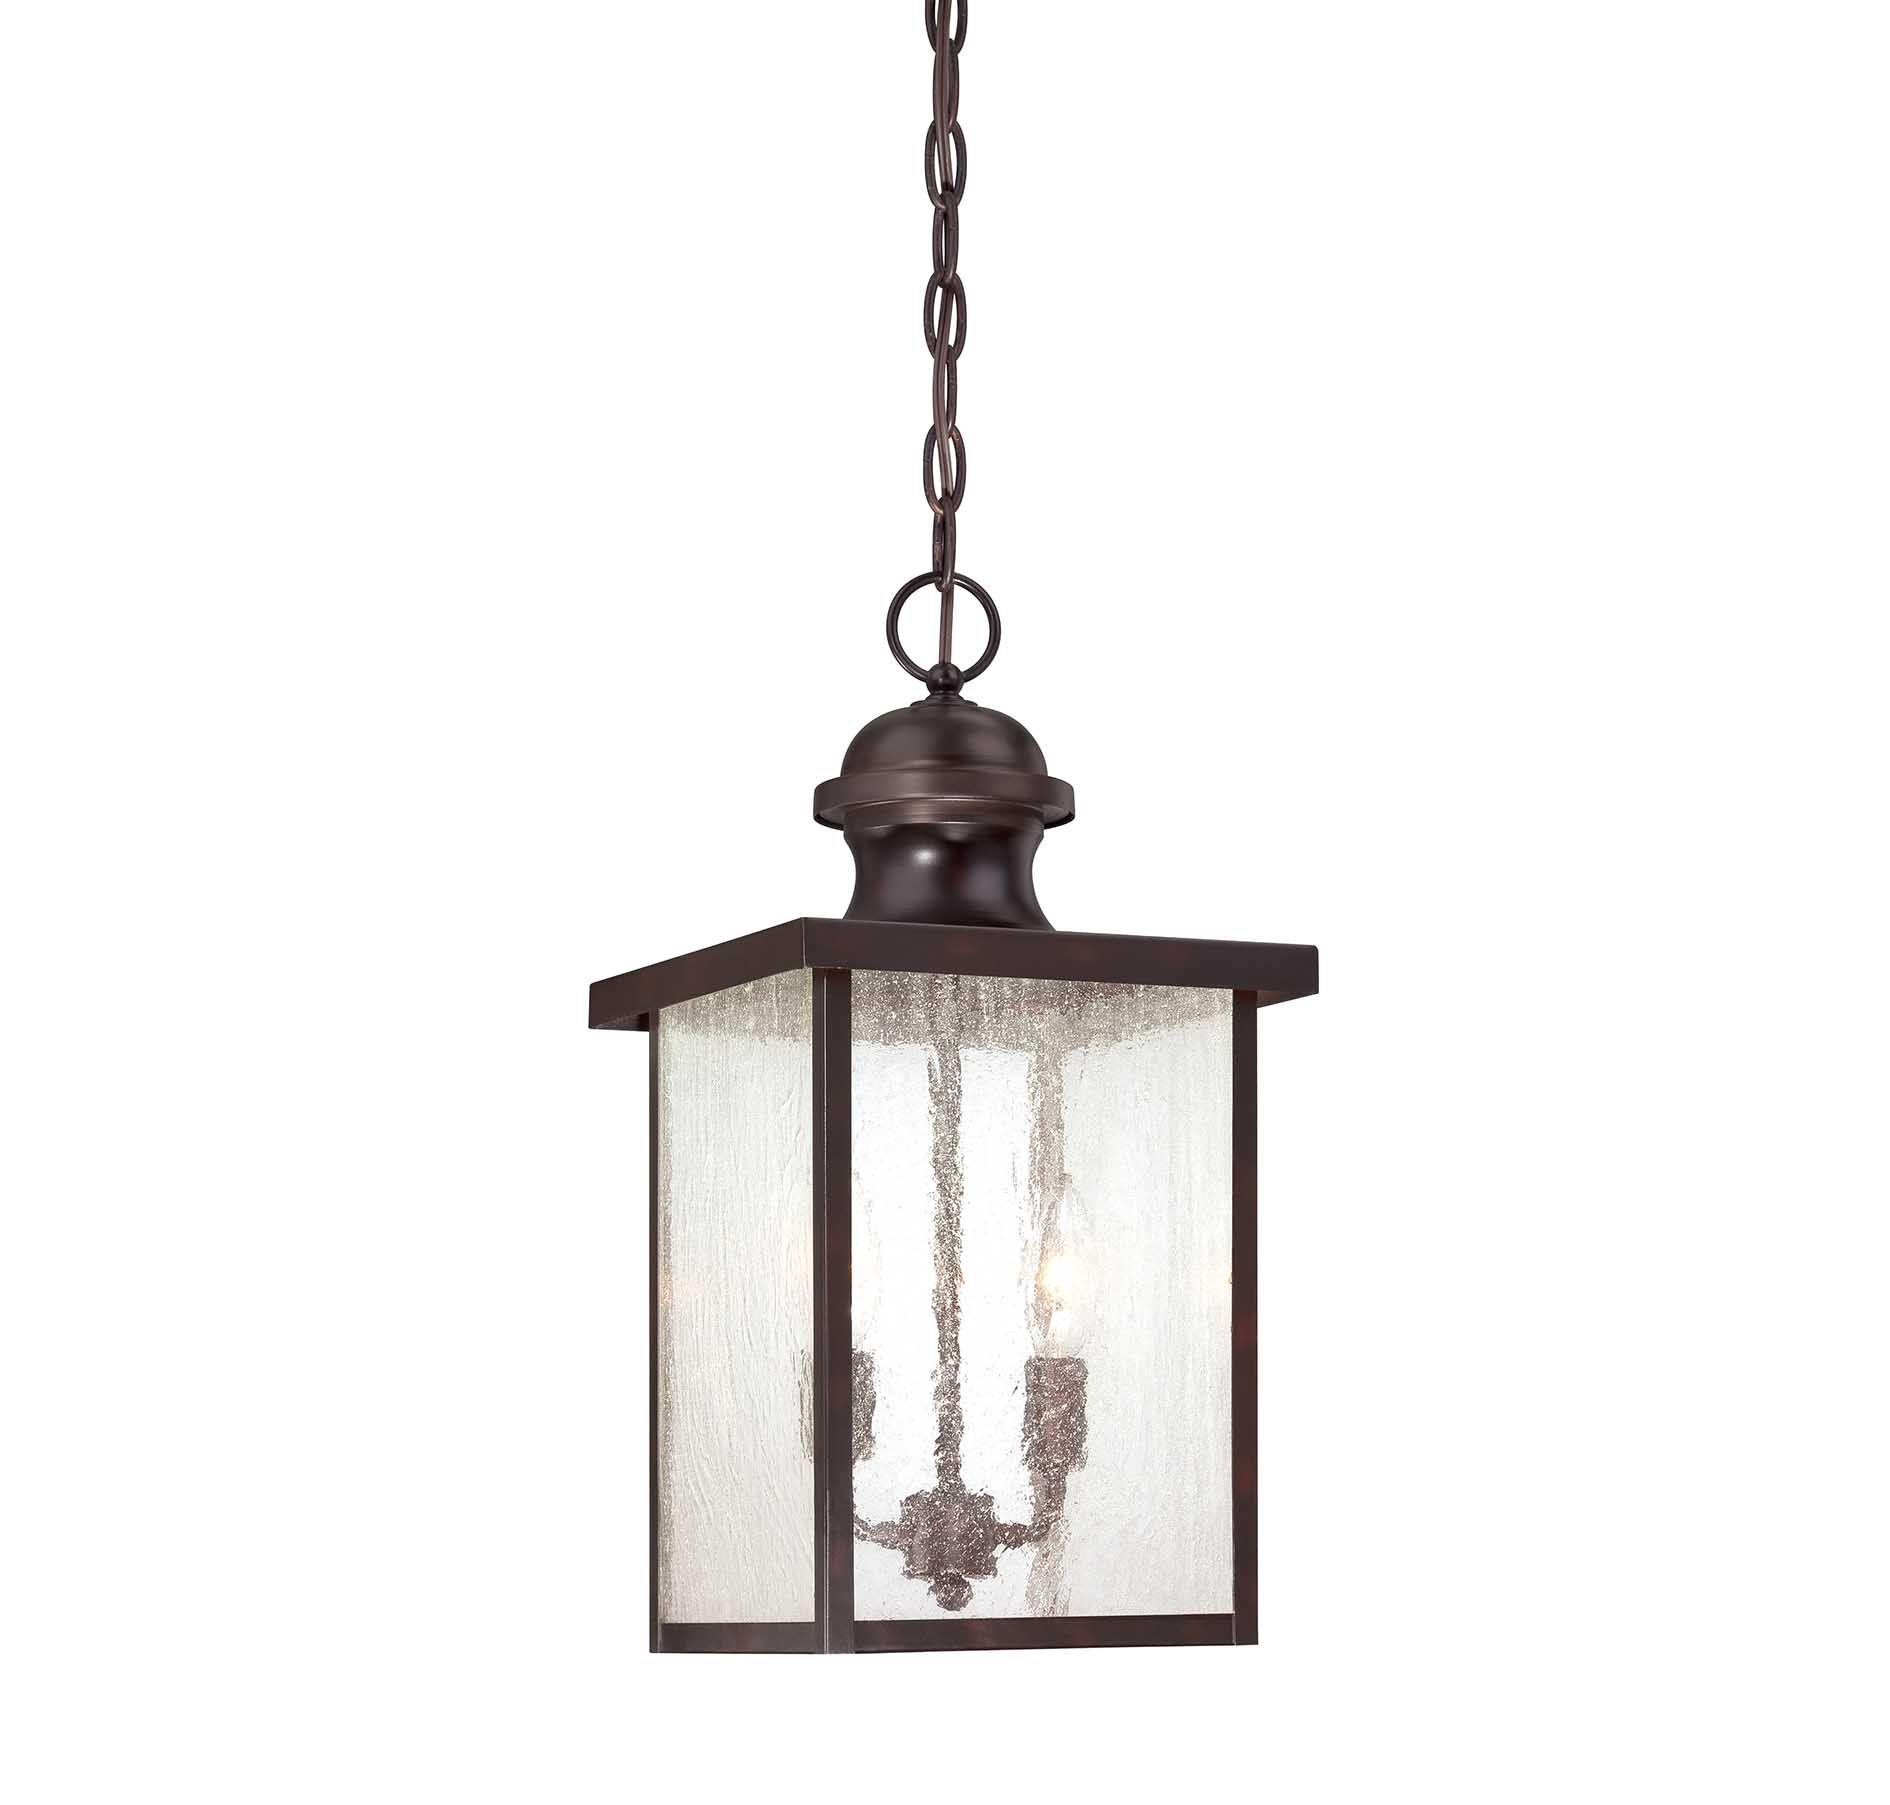 exterior lantern. newberry hanging exterior lantern outdoor lighting products savoy house